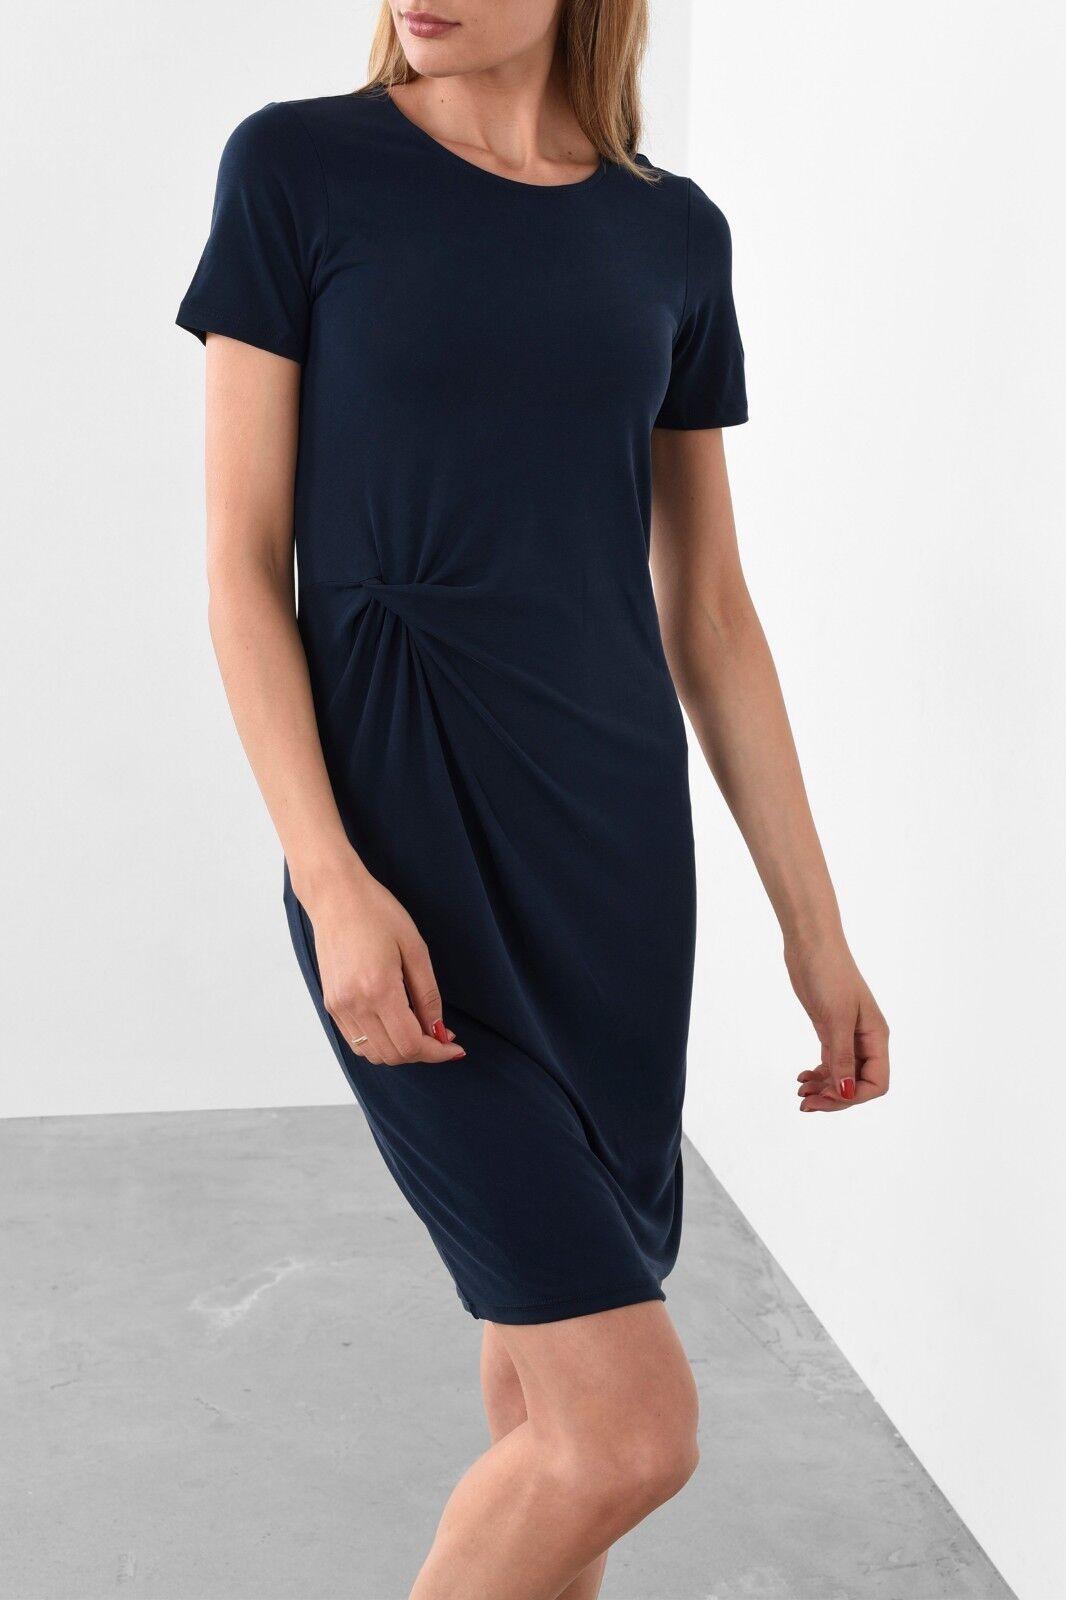 Selected Femme Vivi S Sleeve Drape Dress Size XL BNWT RRP .95 Dark Sapphire